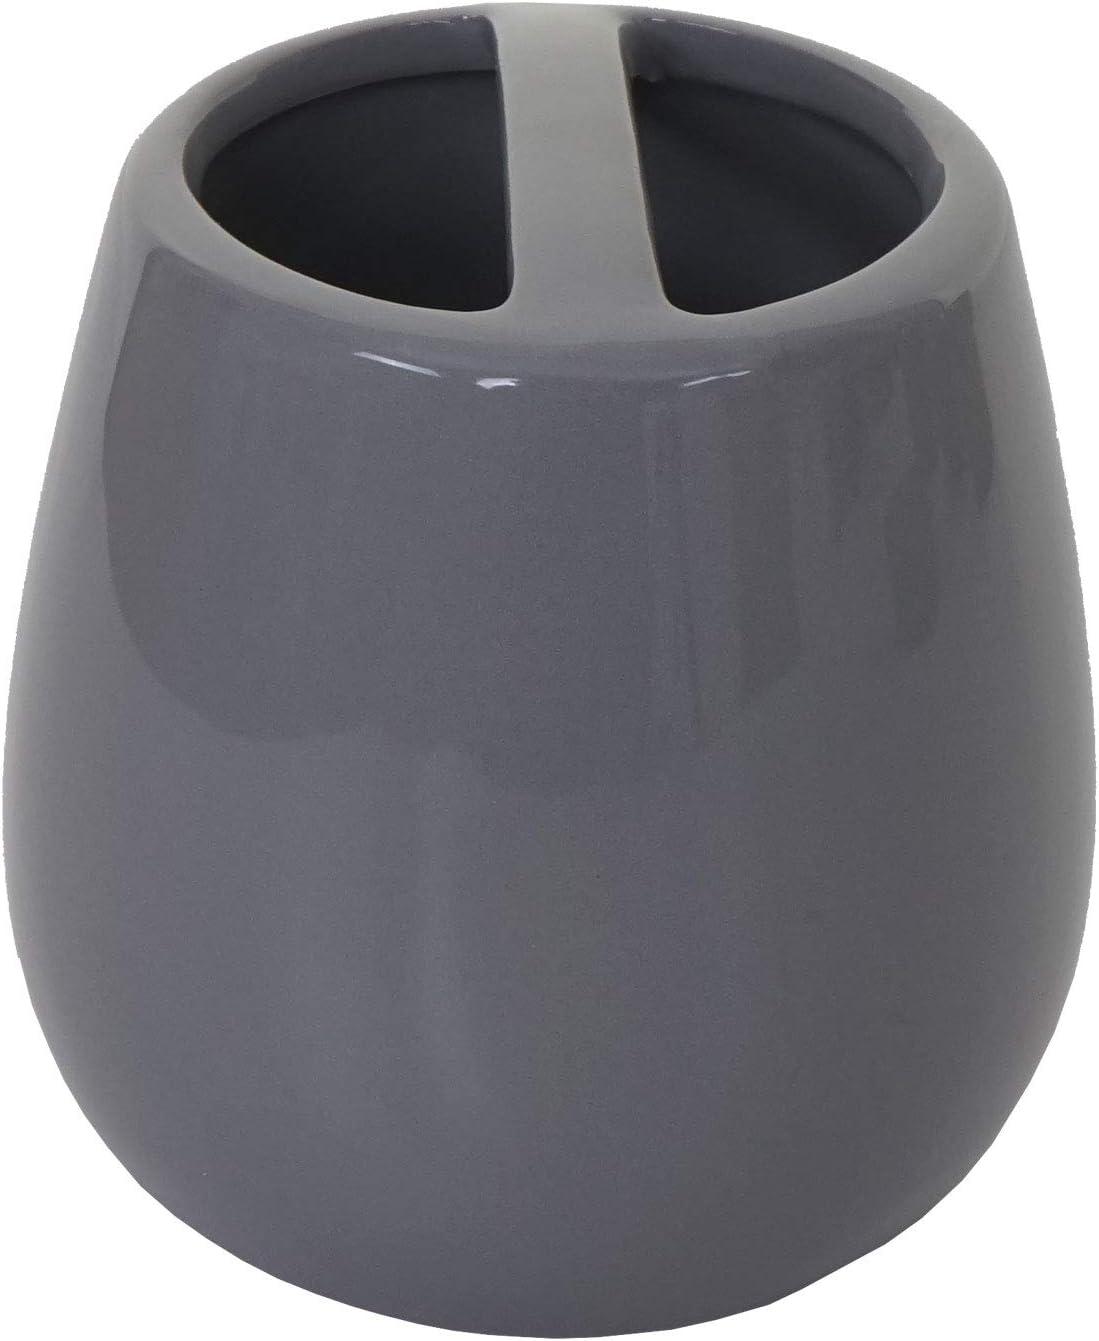 WC-Garnitur Badezimmerset Badaccessoires Mendler 5-teiliges Badset HWC-C72 Keramik ~ grau